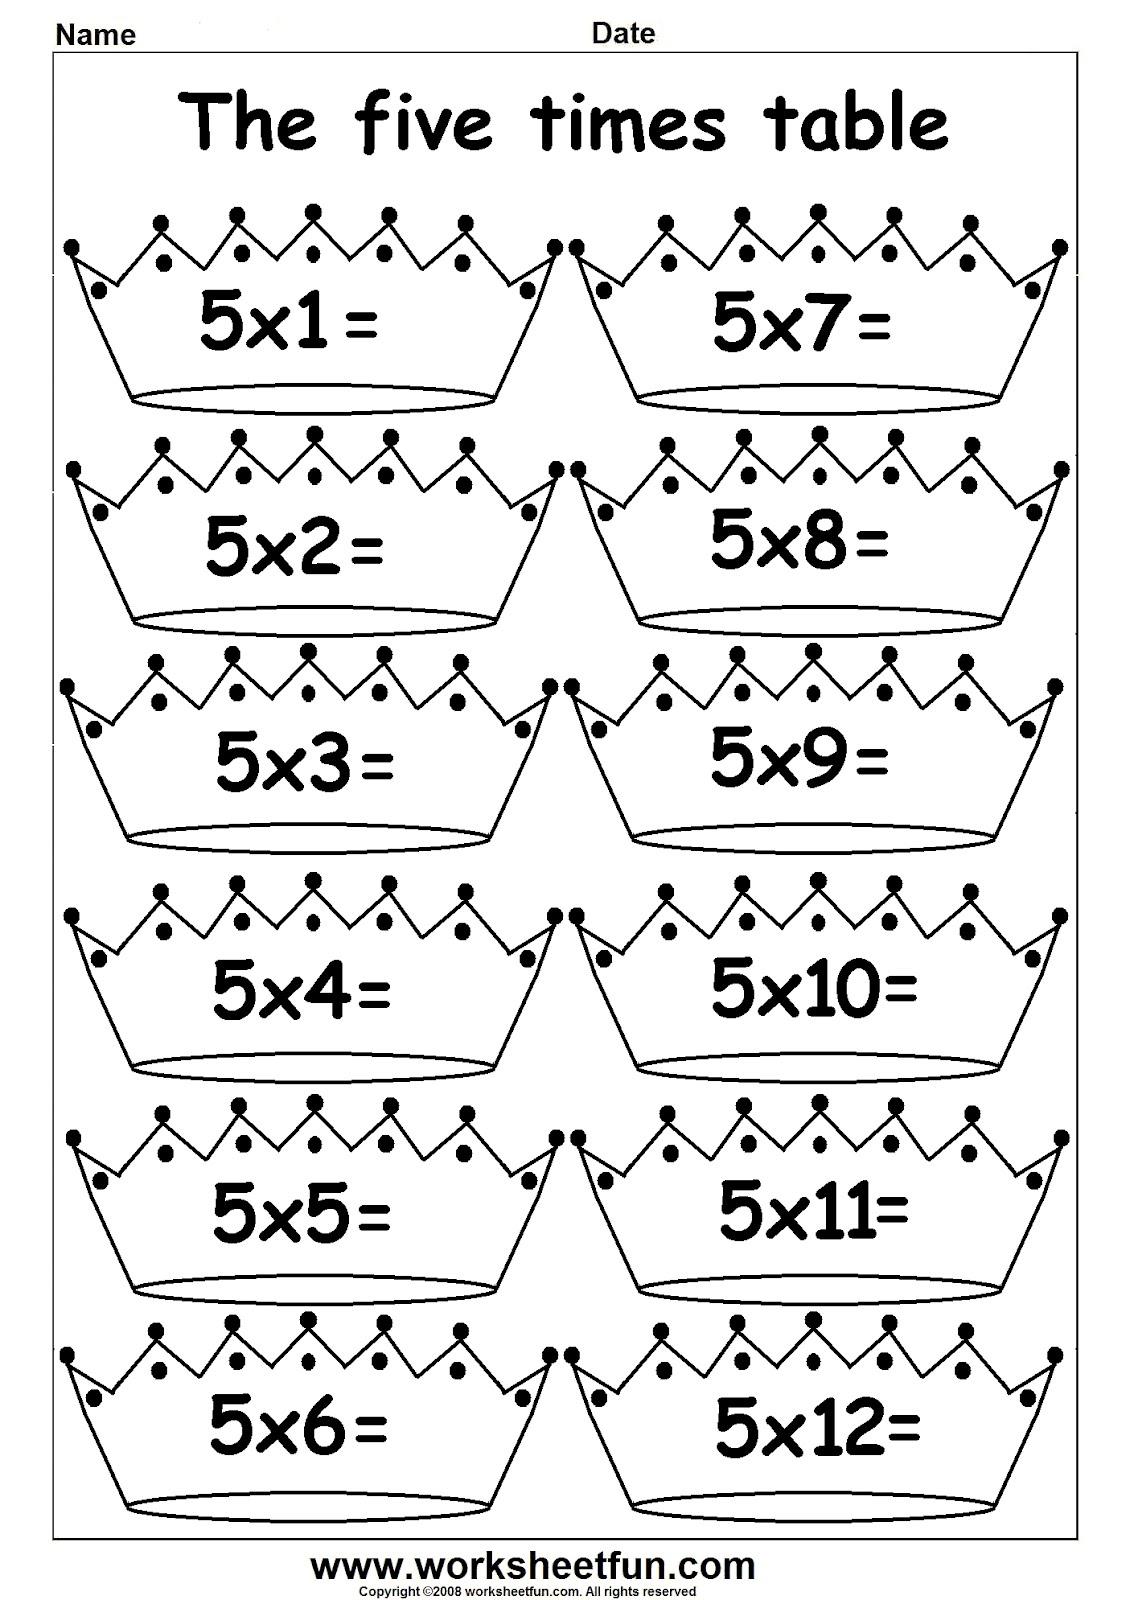 arab unity school grade 1 c blog maths multiply by 5 worksheets. Black Bedroom Furniture Sets. Home Design Ideas